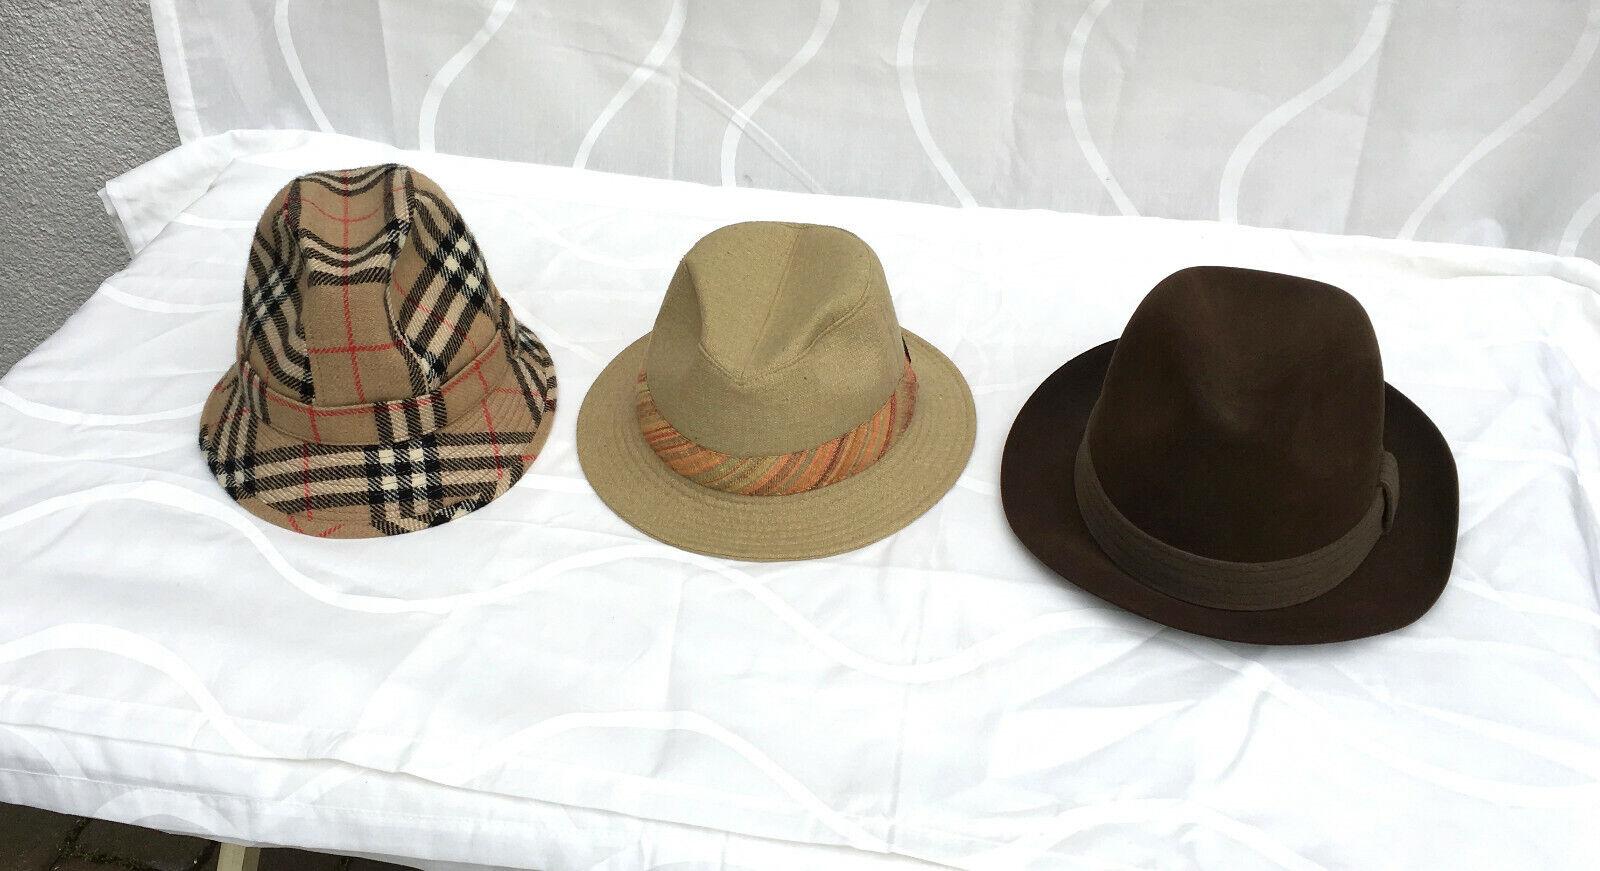 3 x herrenhut, Elegant, well-groomed Mens Hats, Mayser, hückel and Wigens, Size 56